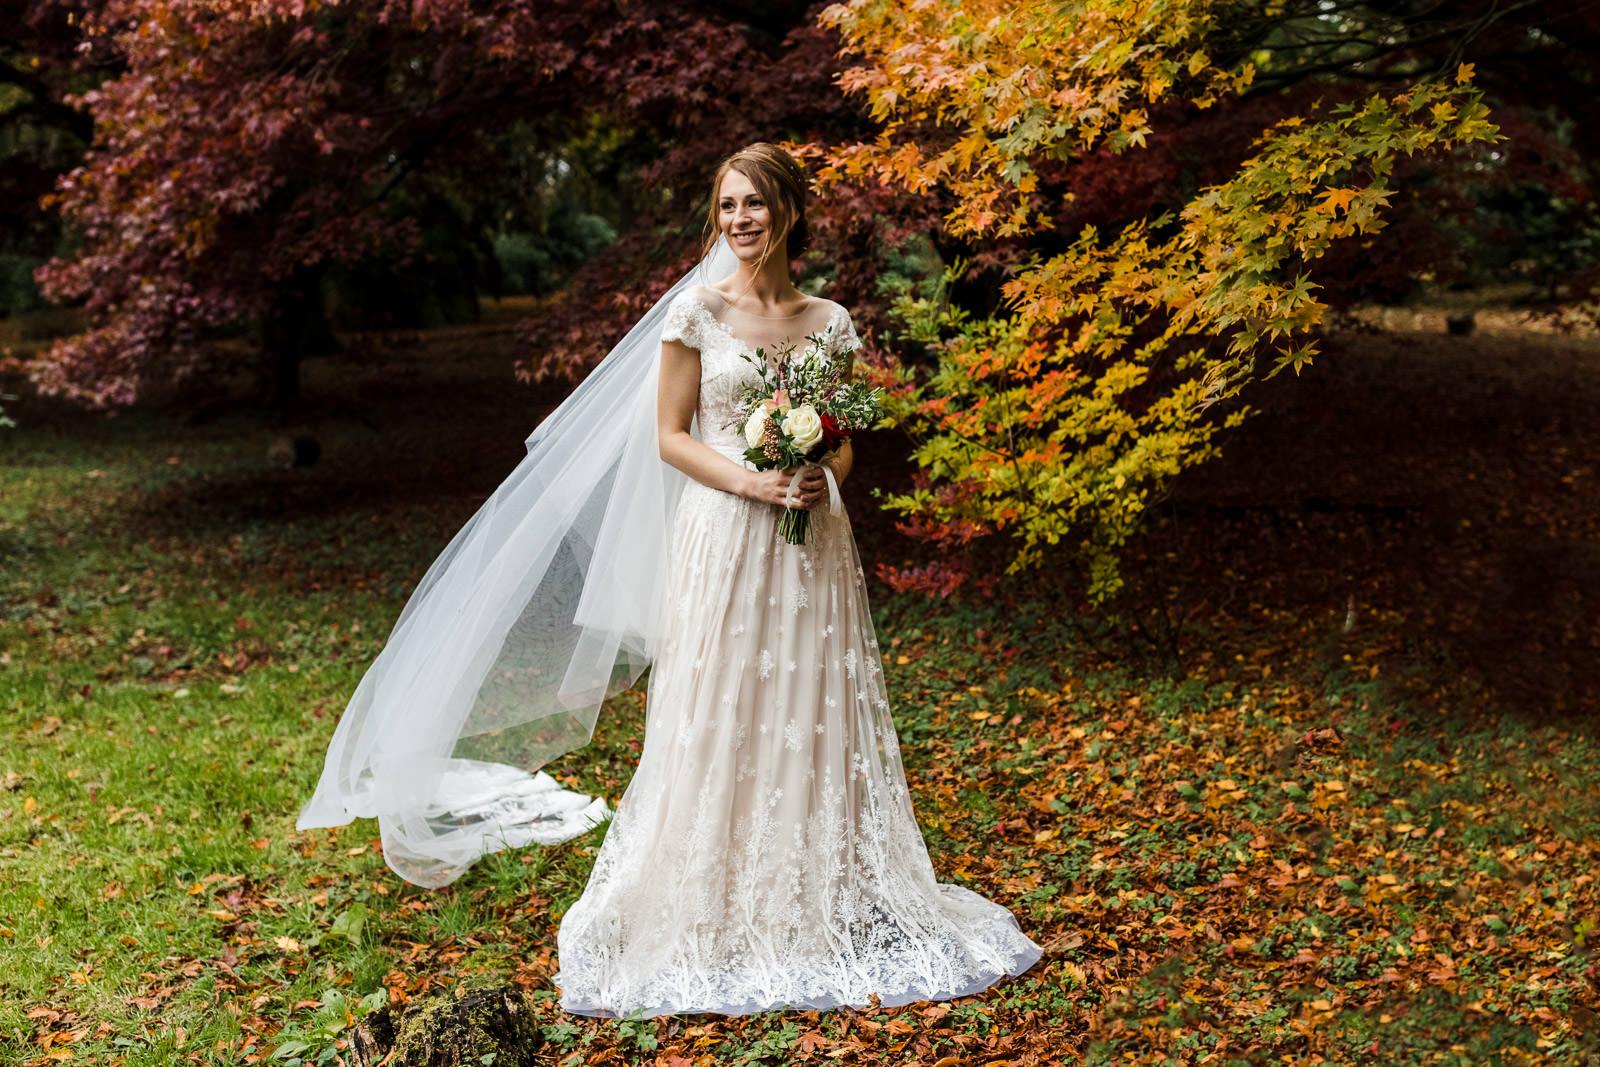 Miskin Manor Wedding Photography - Art by Design Photography - Bride